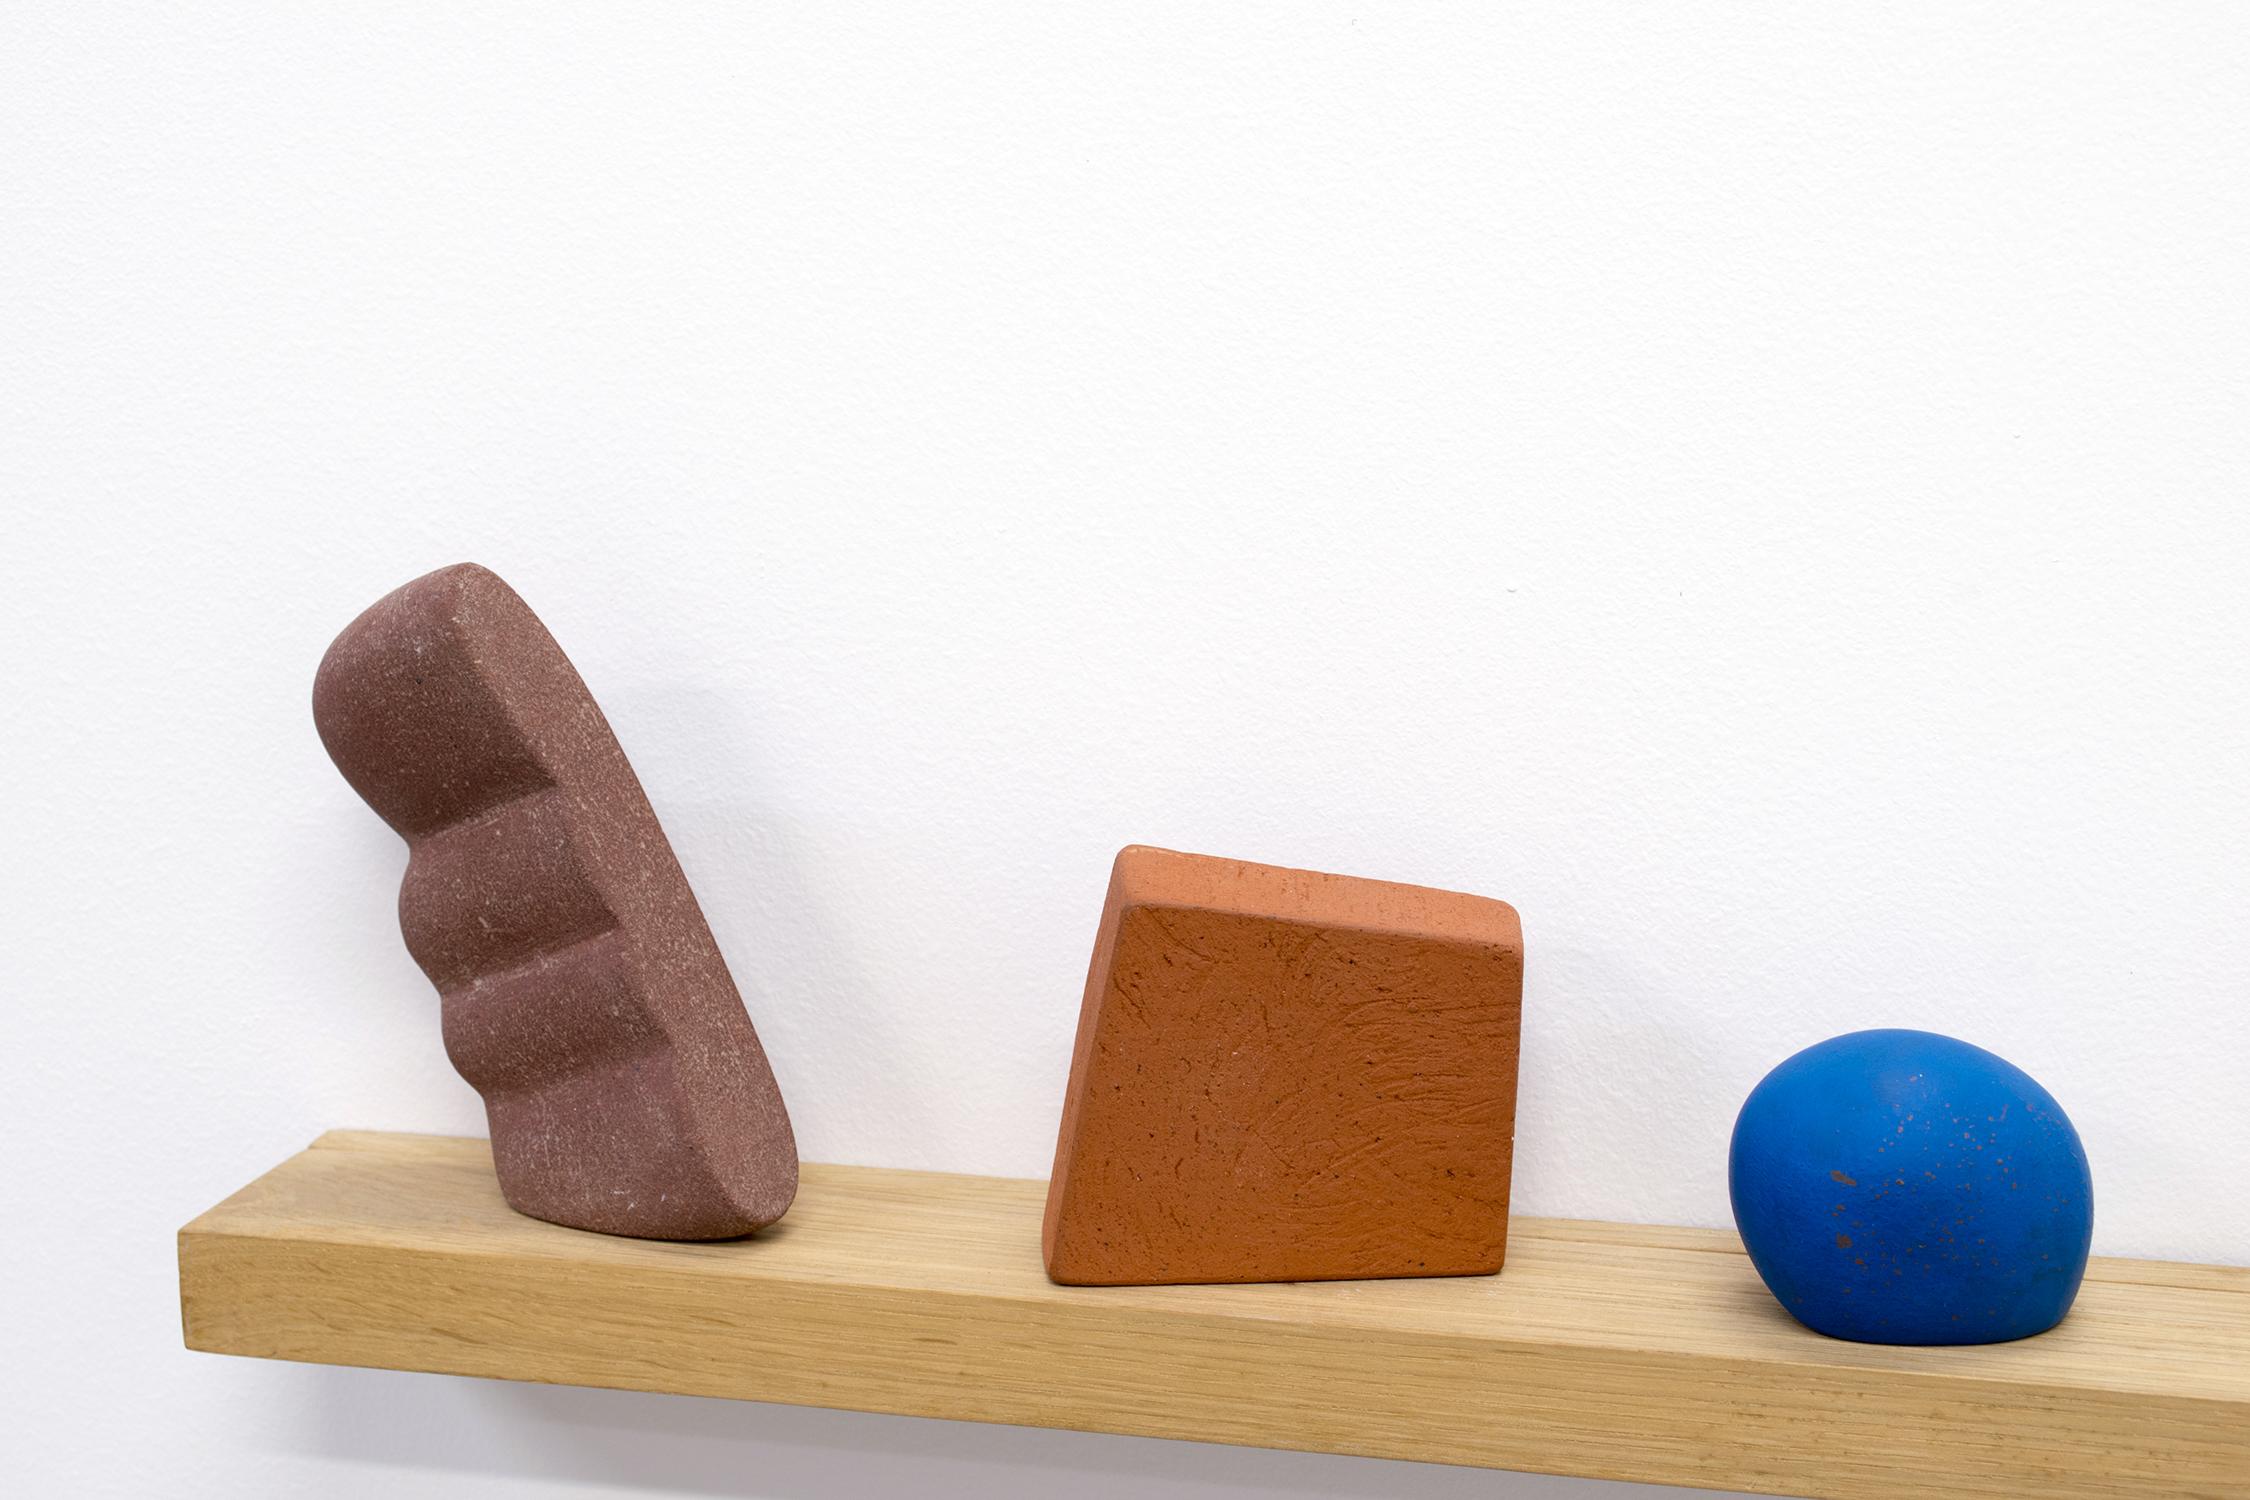 Three & Three, 2017  7 x 32 x 3 inches  ceramic, wood, epoxy putty, sand, and gouache